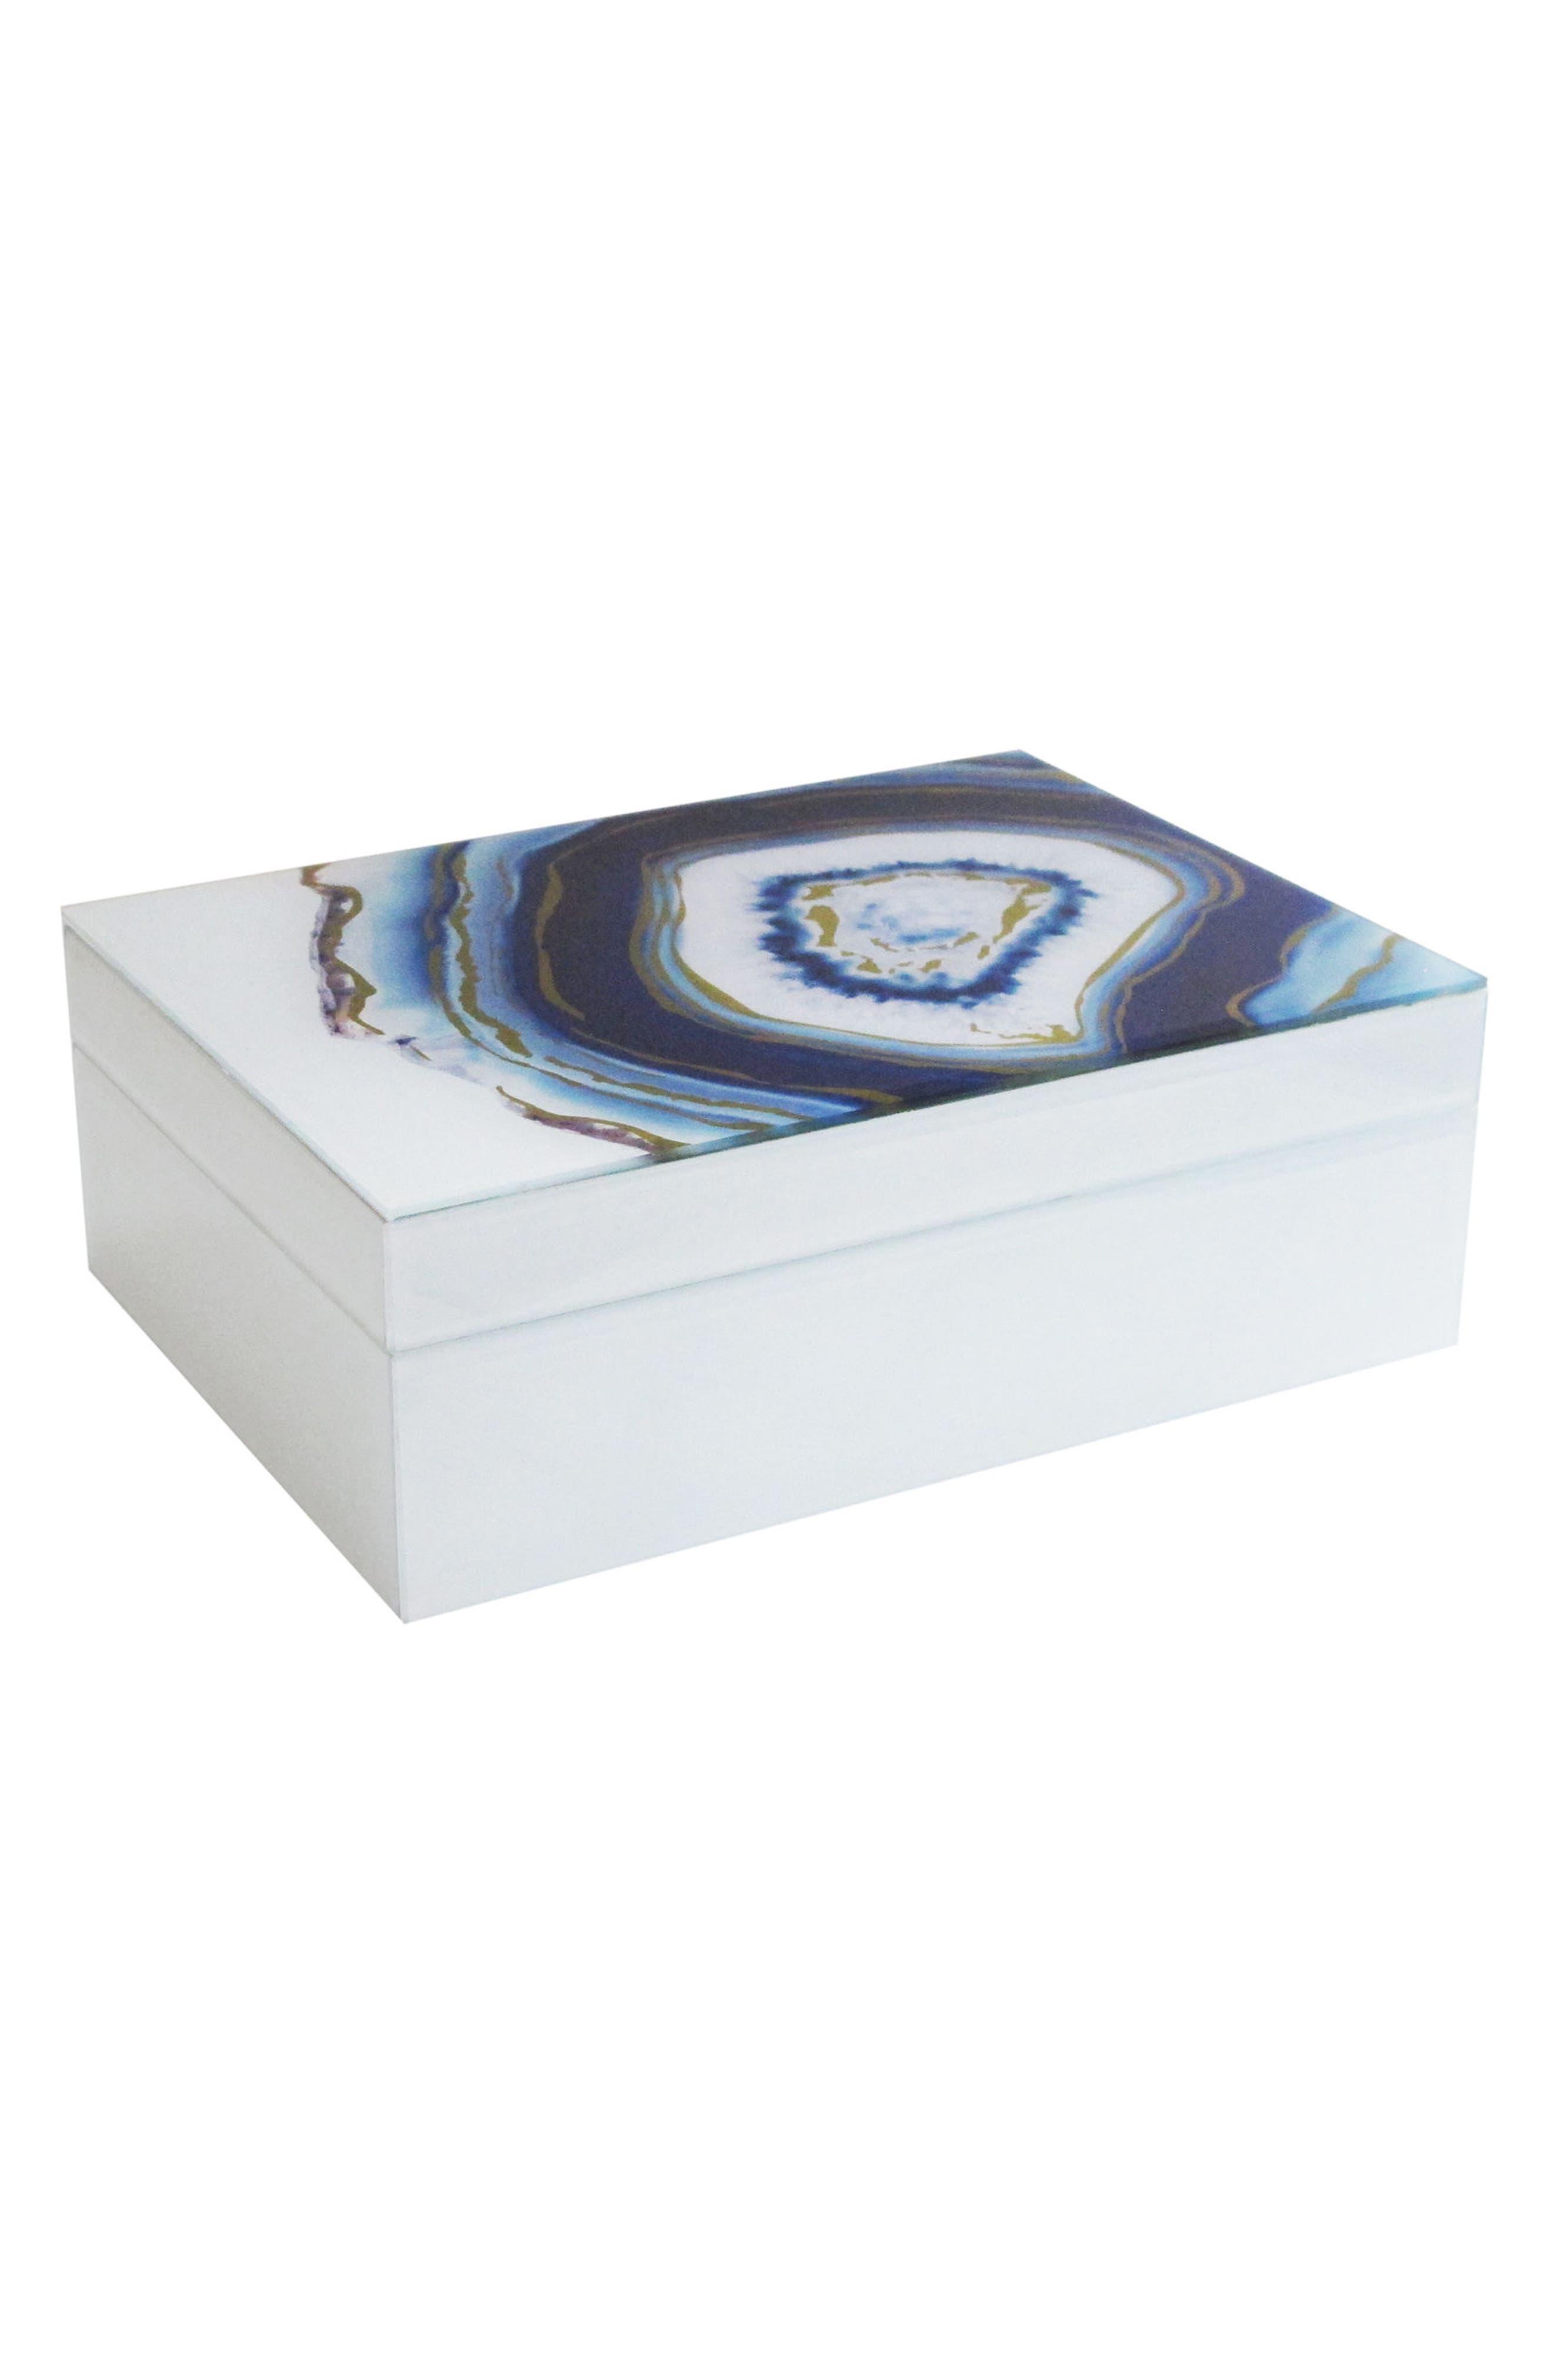 Main Image - American Atelier Agate Swirl Jewelry Box